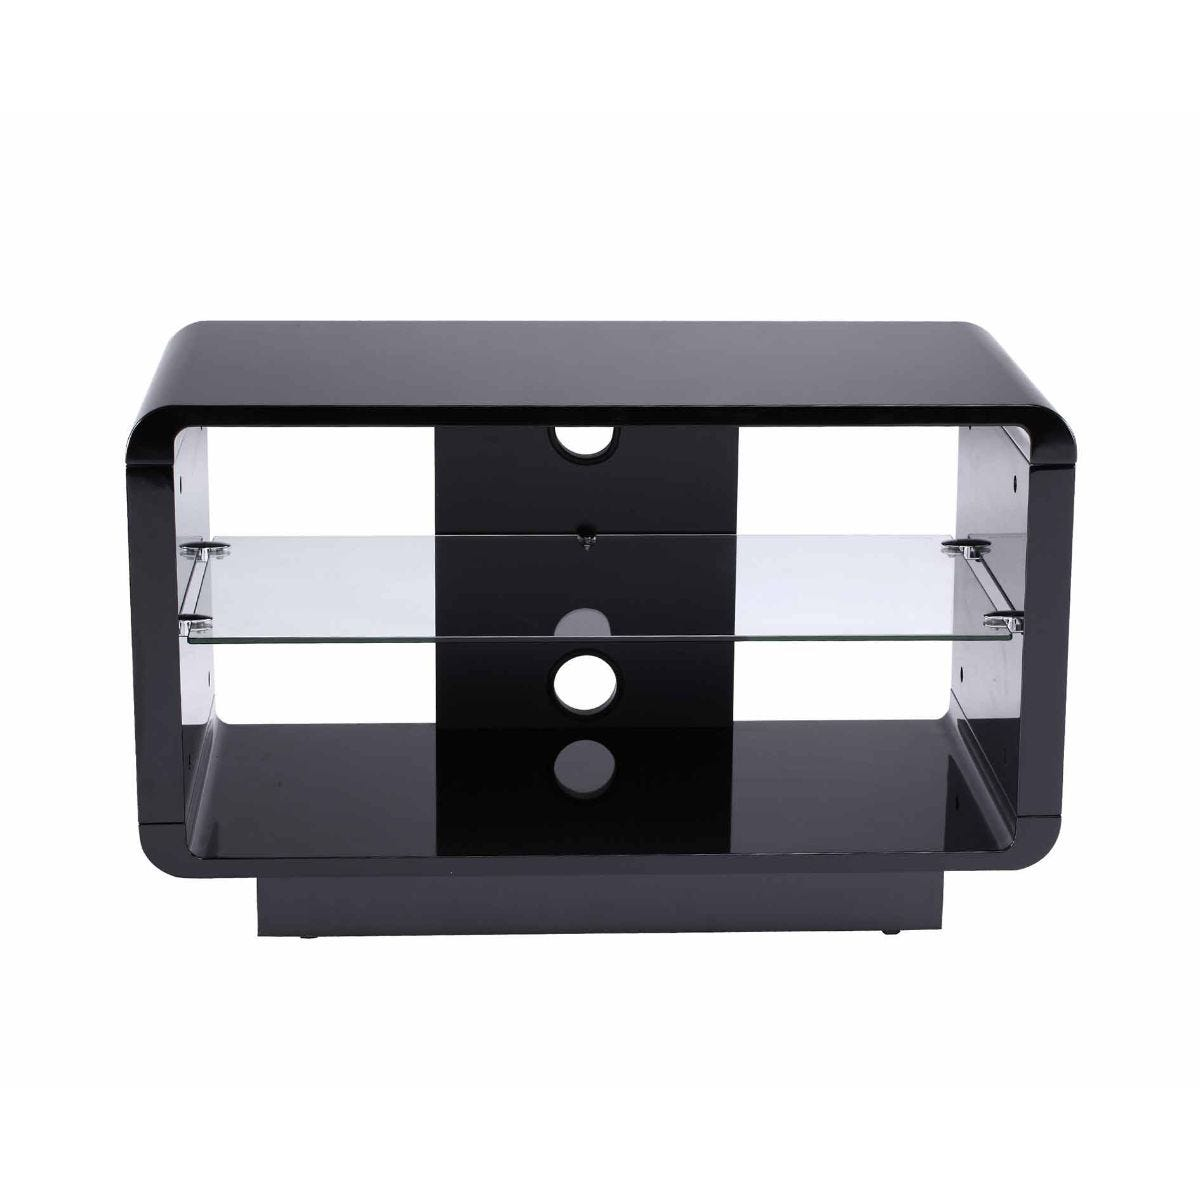 Alphason Luna 800 TV Stand, Black